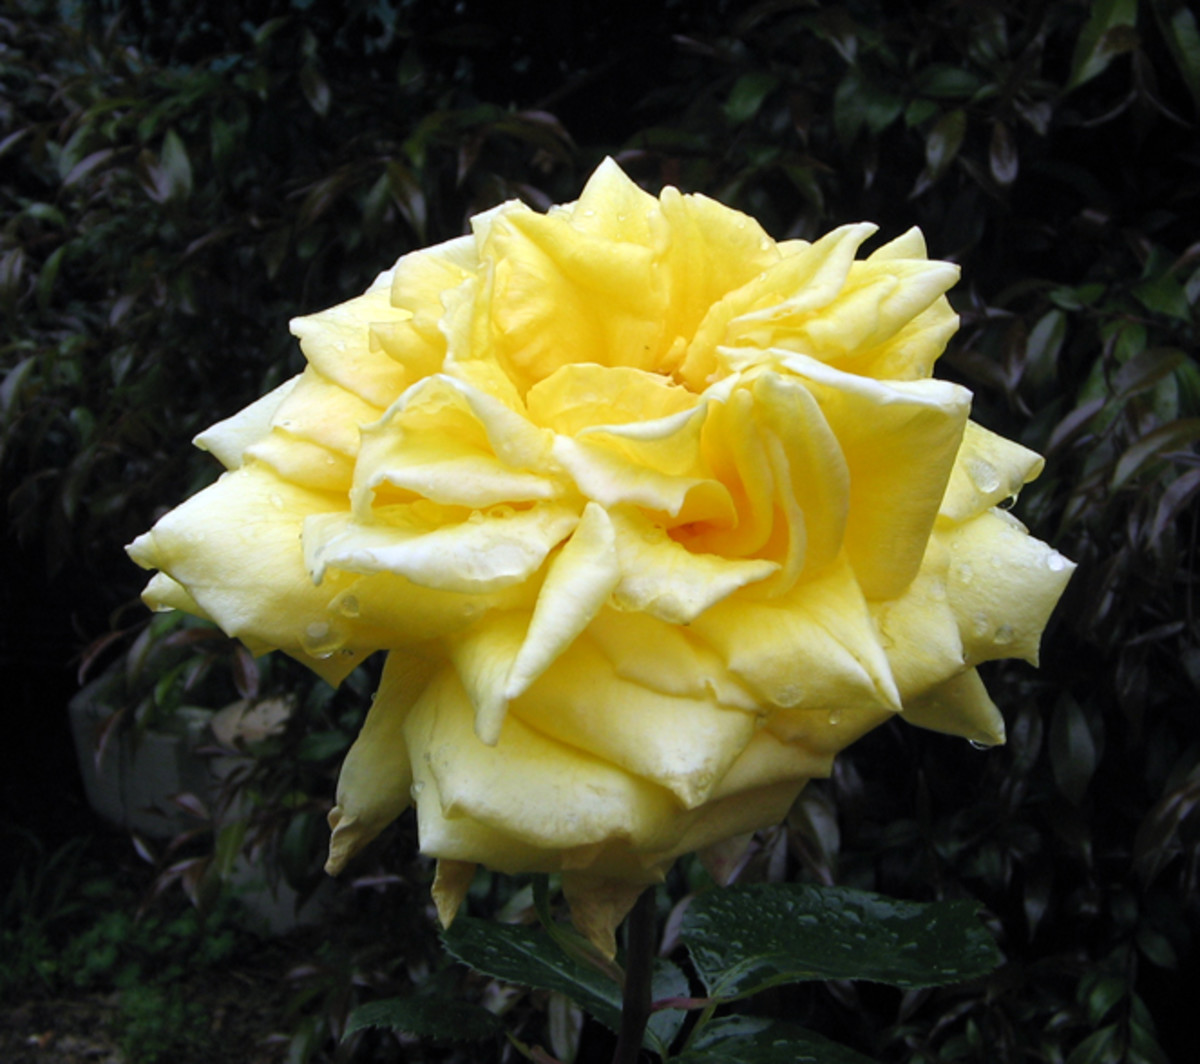 The Children's Rose aka 'Gina Lollobrigida'